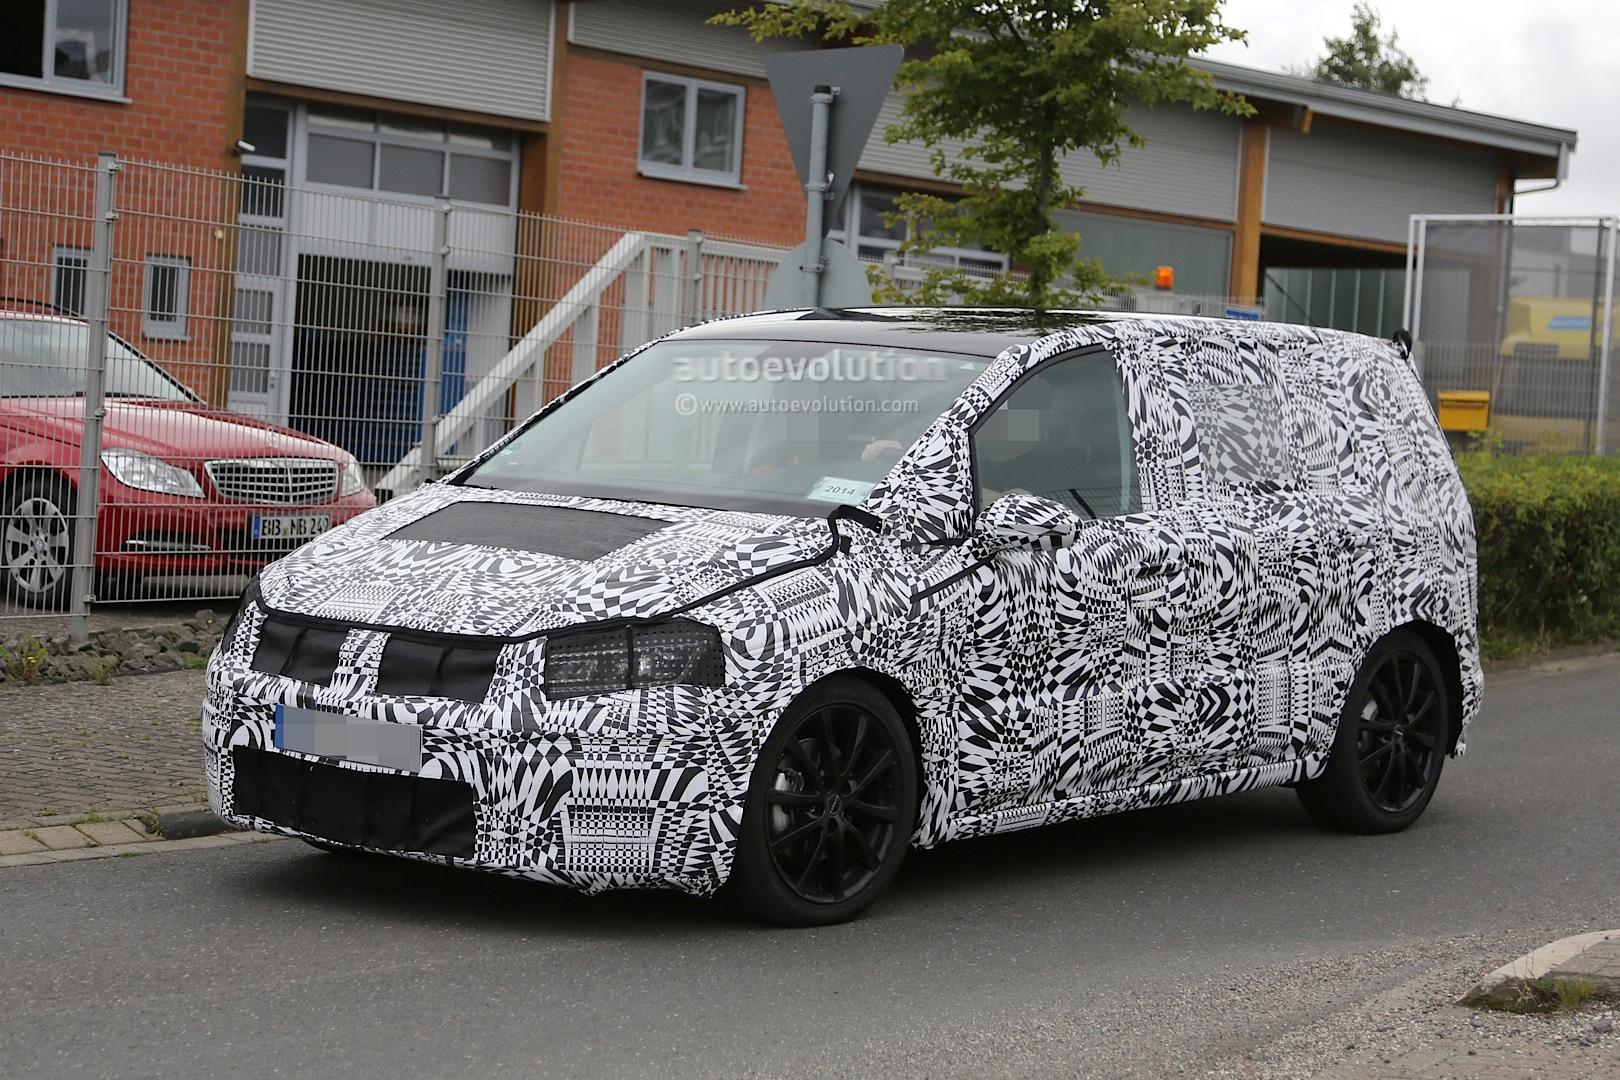 2015 - [Volkswagen] Touran - Page 3 2015-volkswagen-touran-spied-with-led-headlights_10